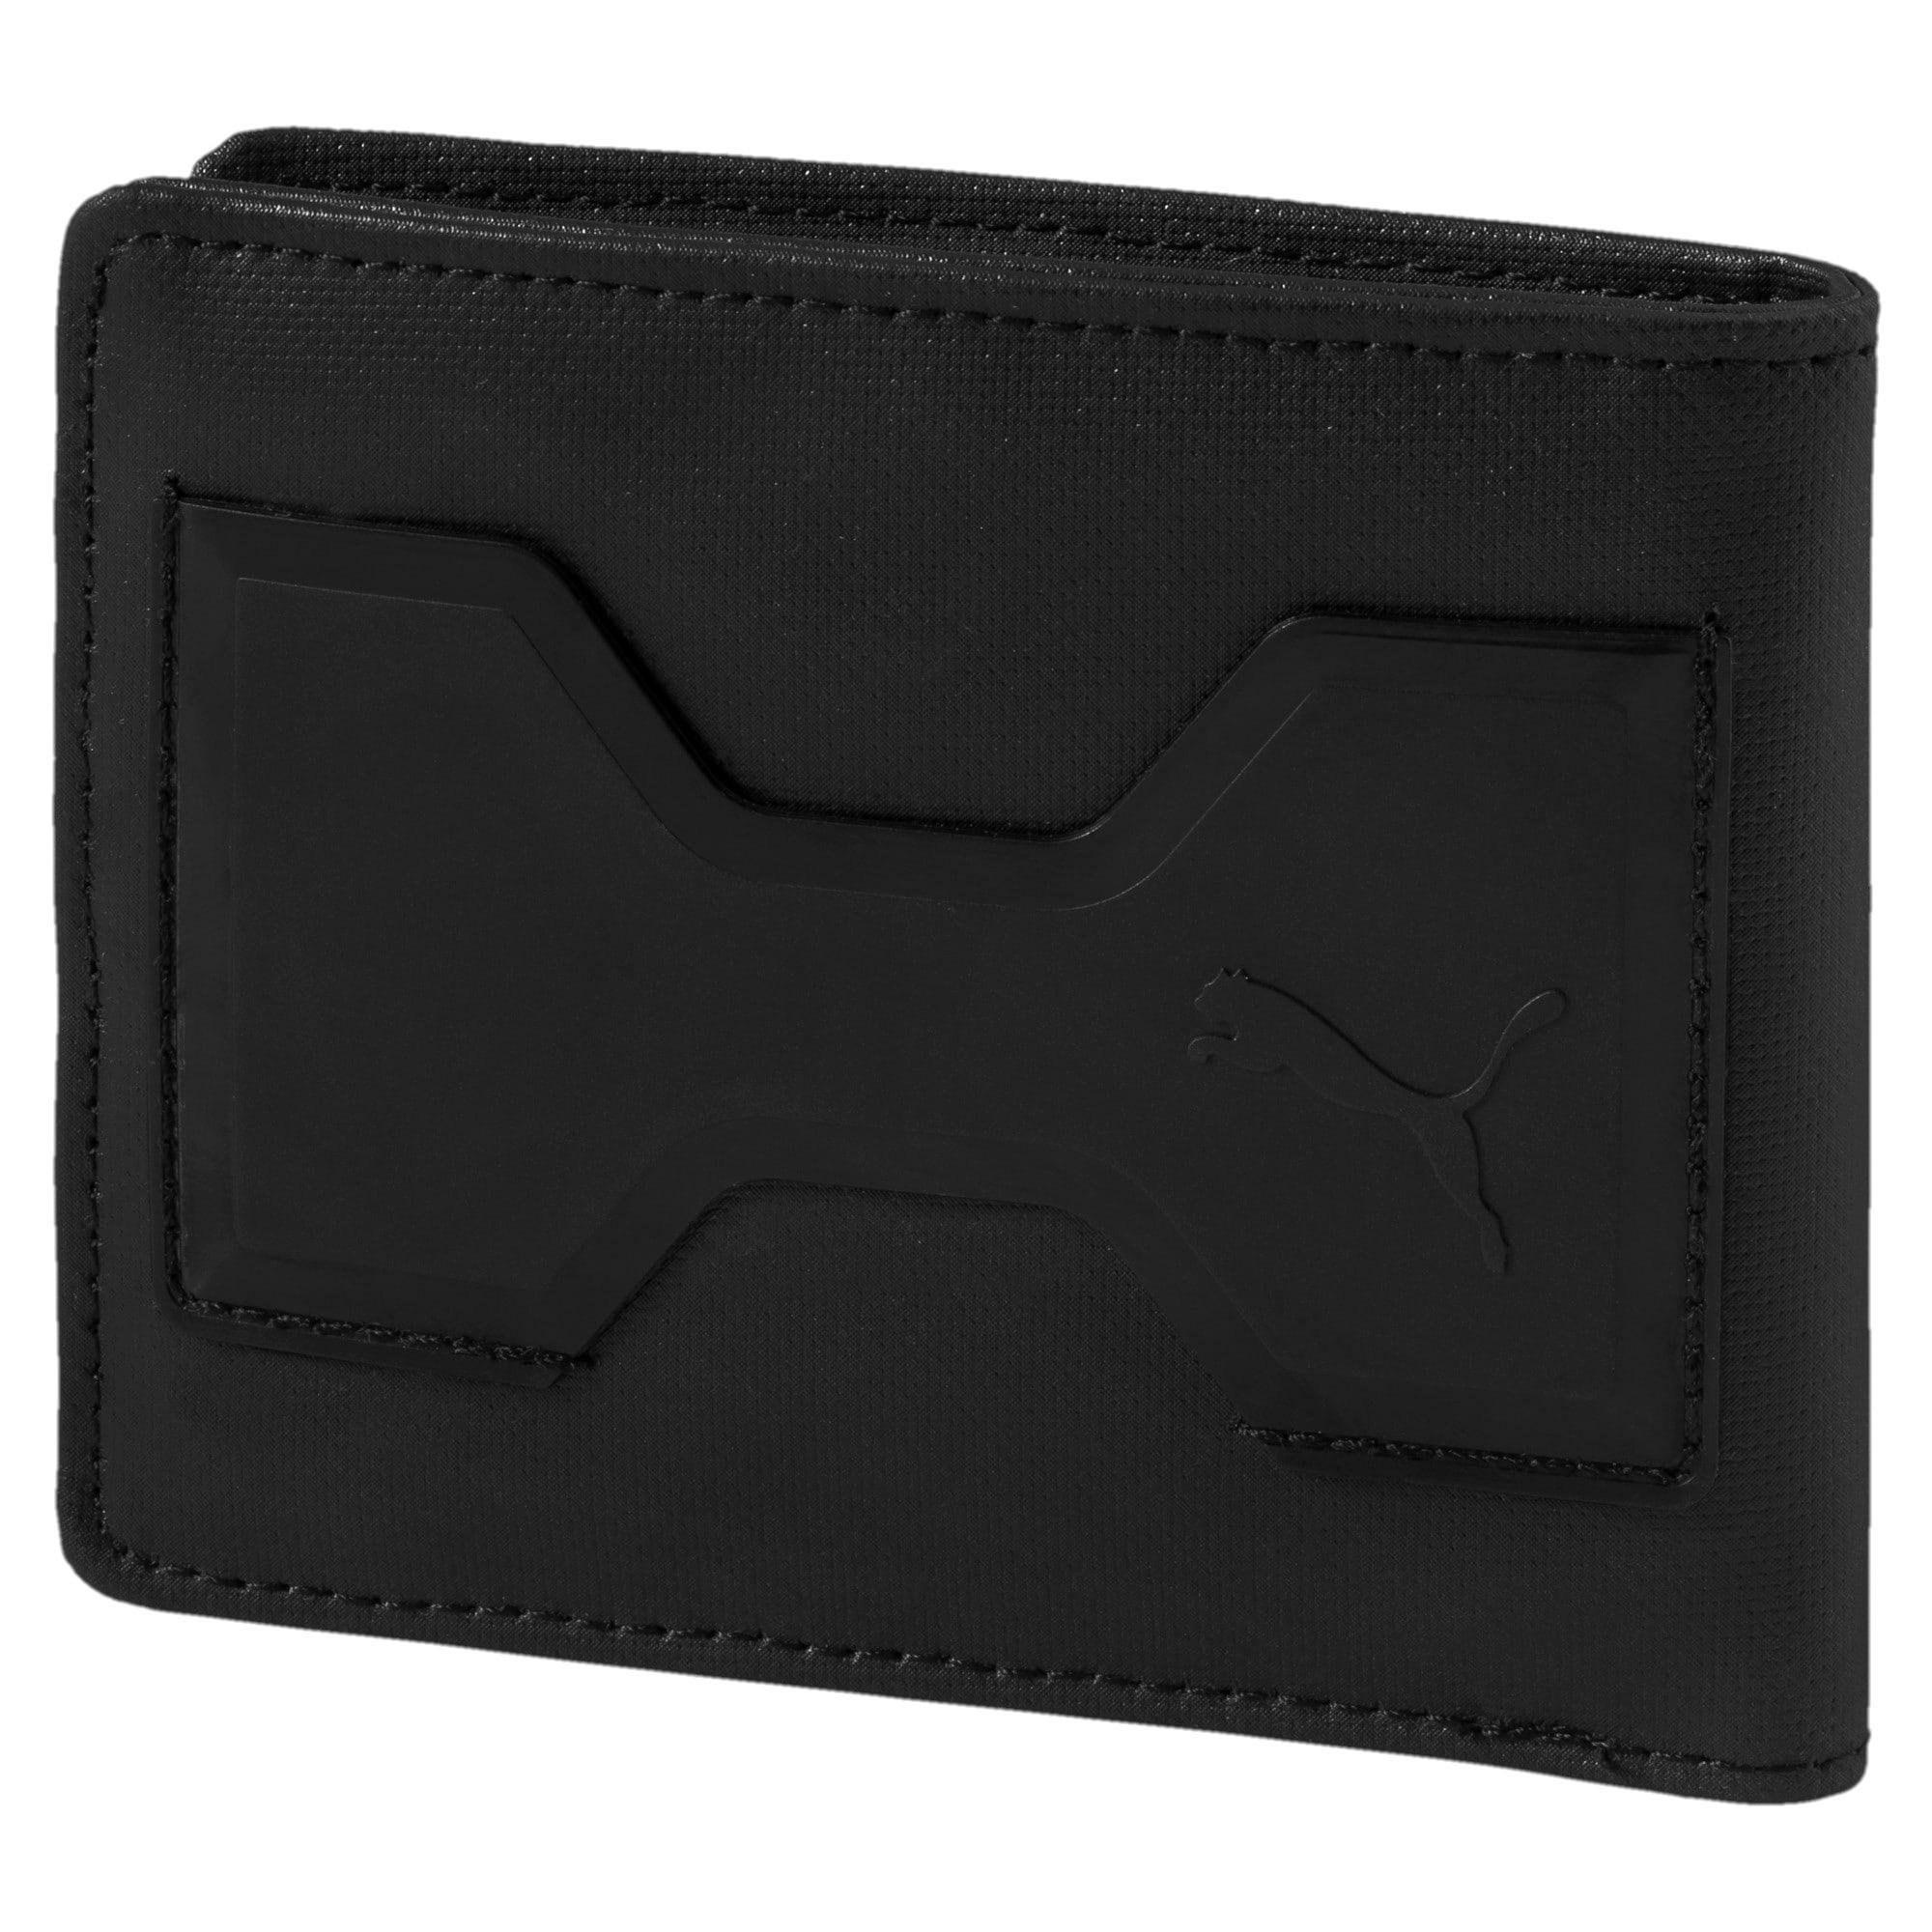 Thumbnail 2 of BMW Motorsport Wallet, Puma Black, medium-IND